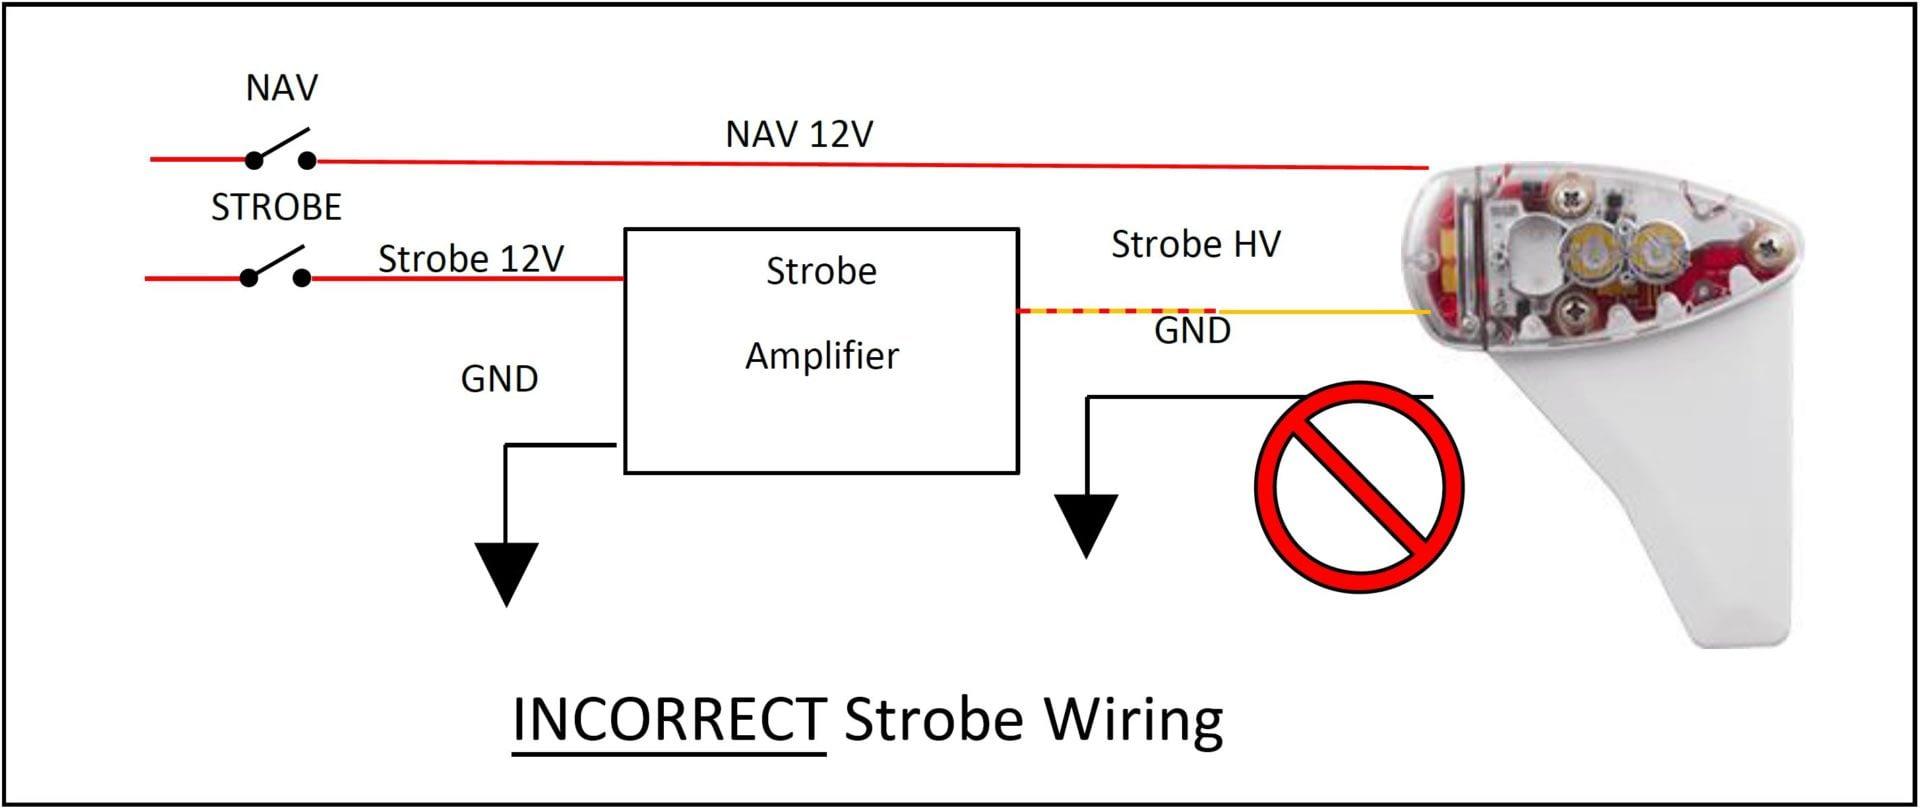 Strobe Wiring Diagram